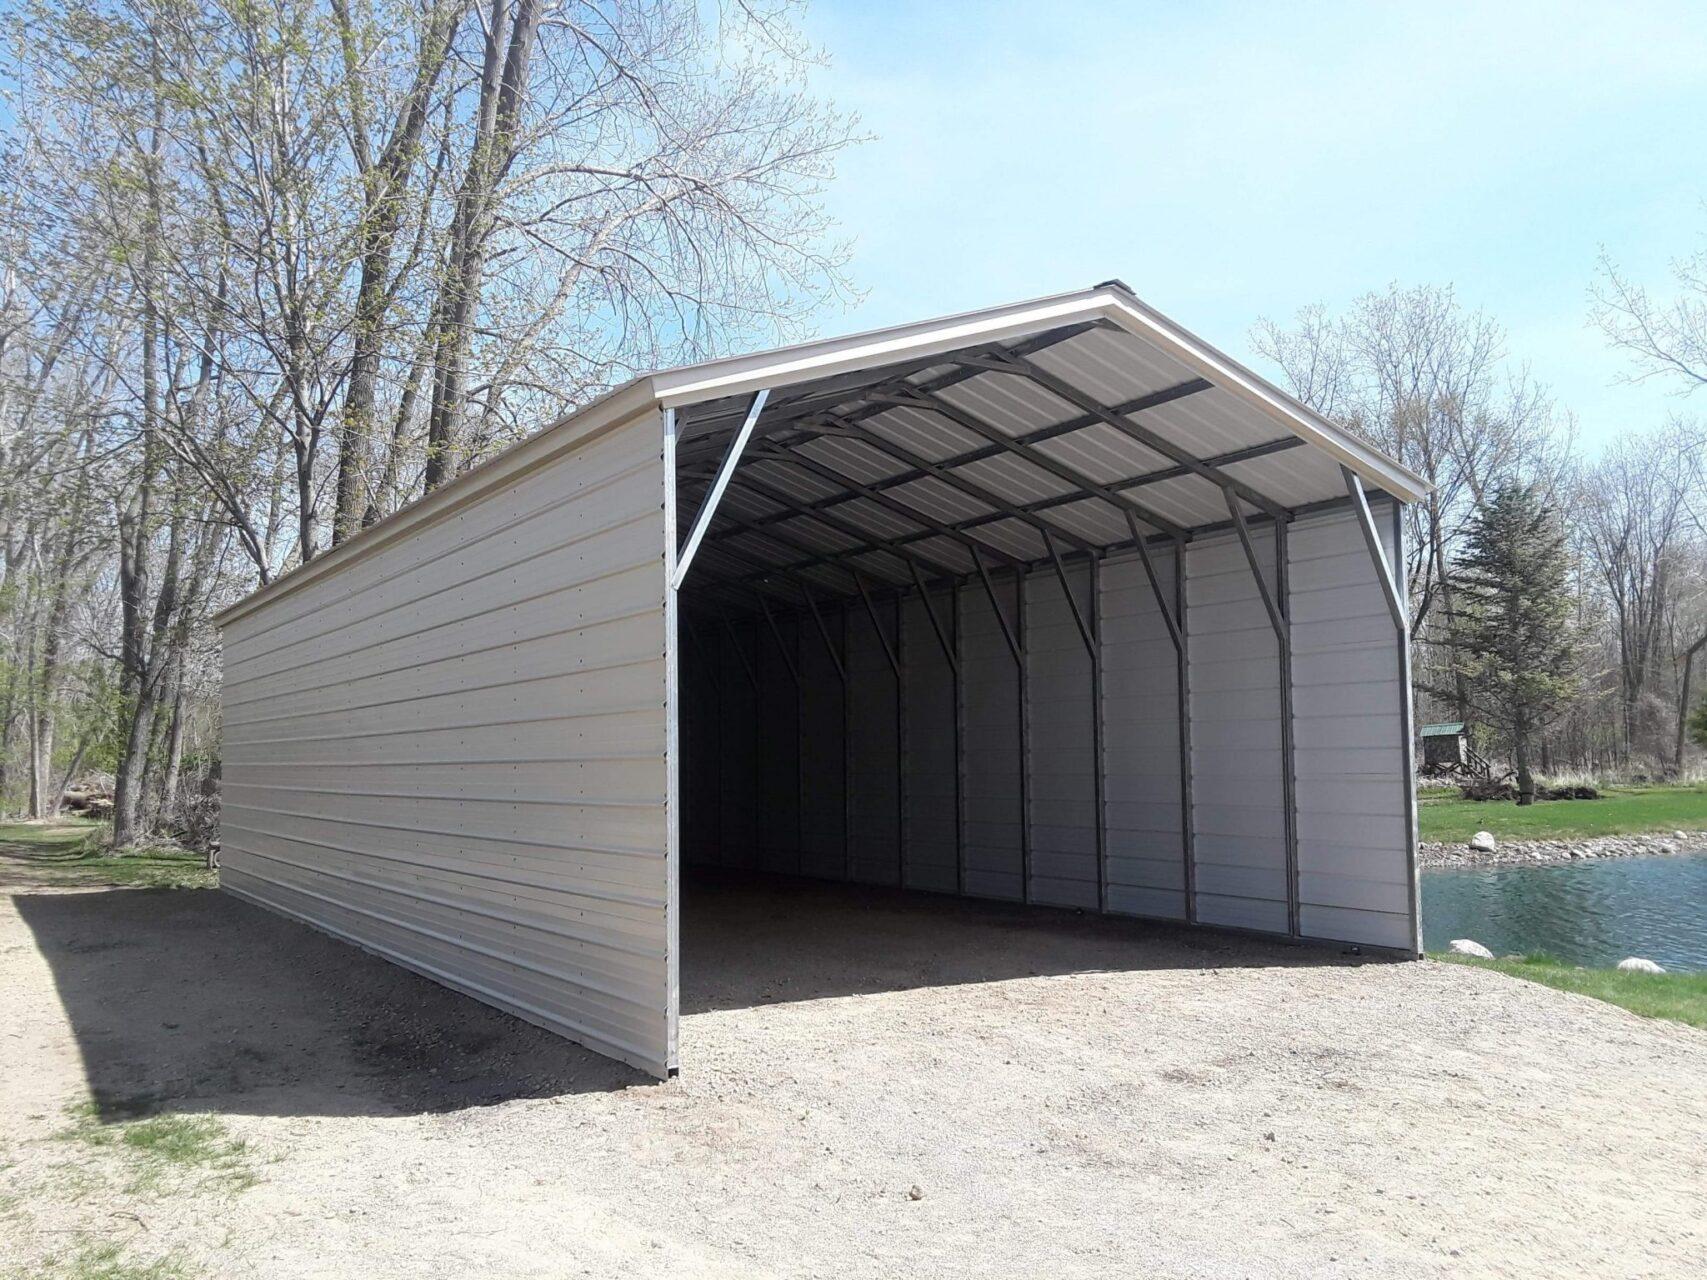 18x40x10 RV Carport with Closed Sides in Sandusky, Michigan